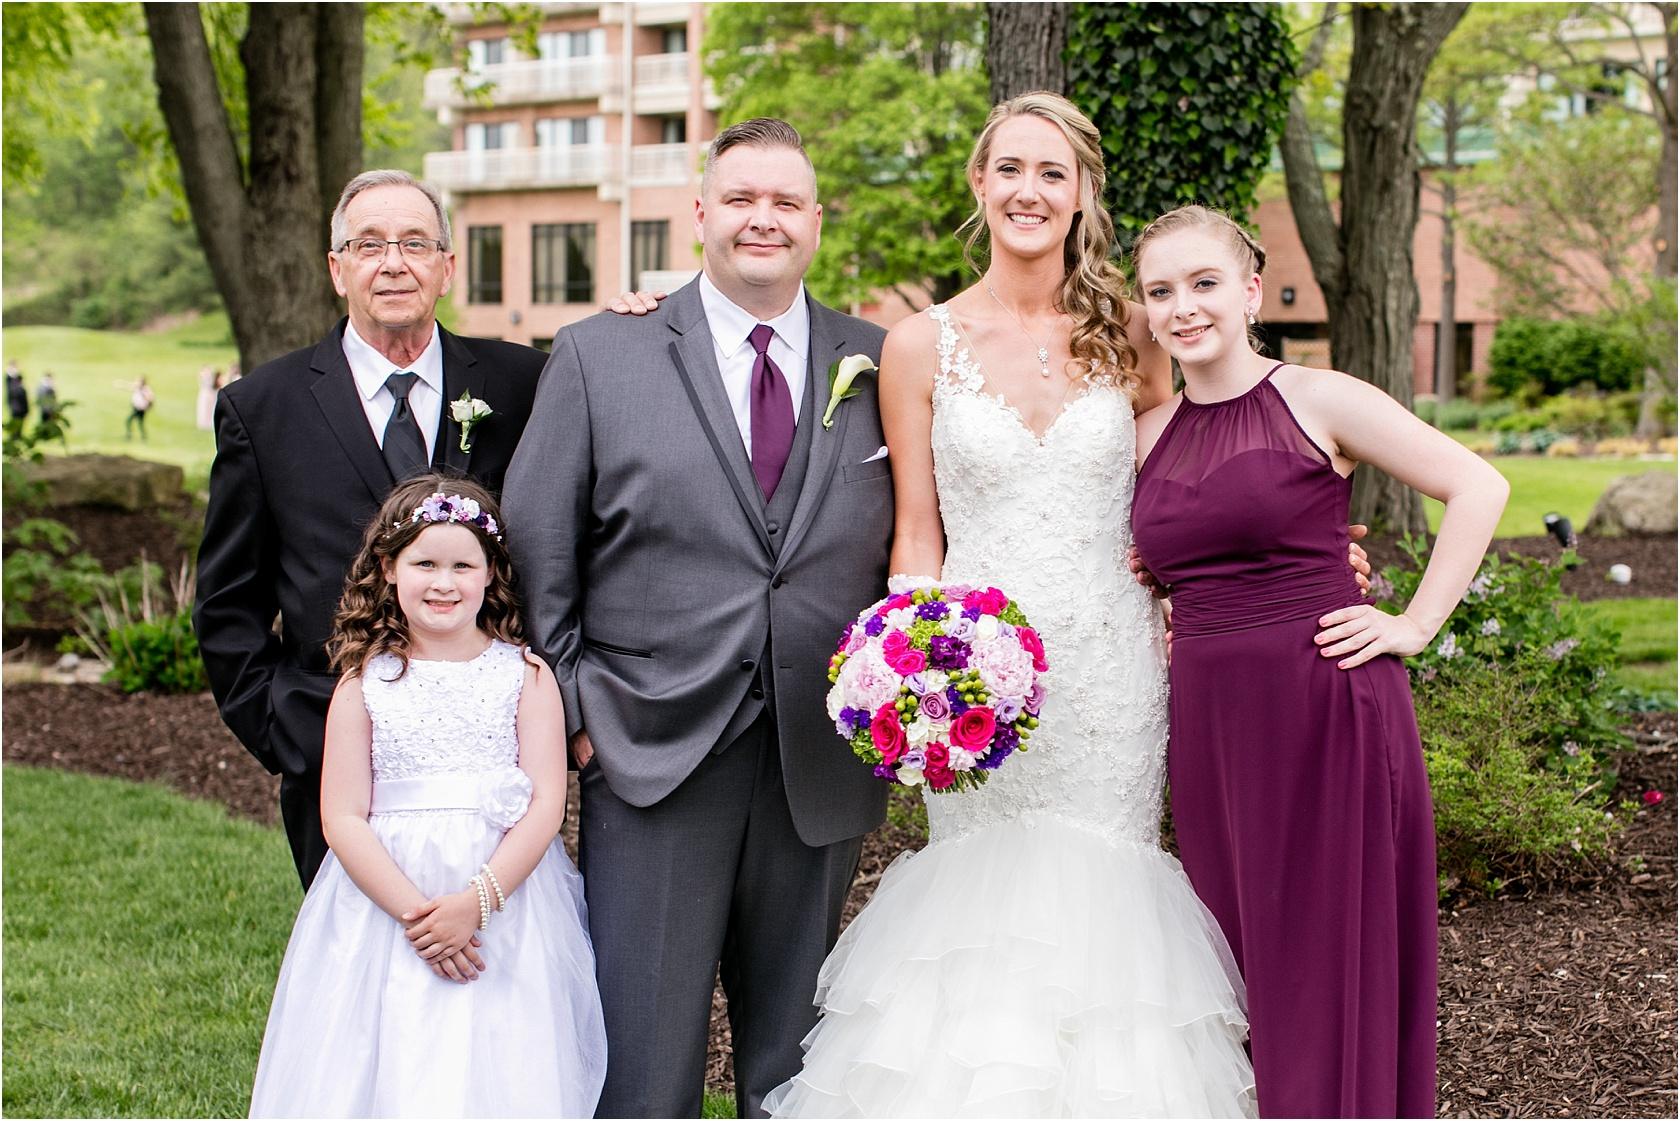 Sagal Wedding Turf Valley Resort Wedding Living Radiant Photography_0114.jpg